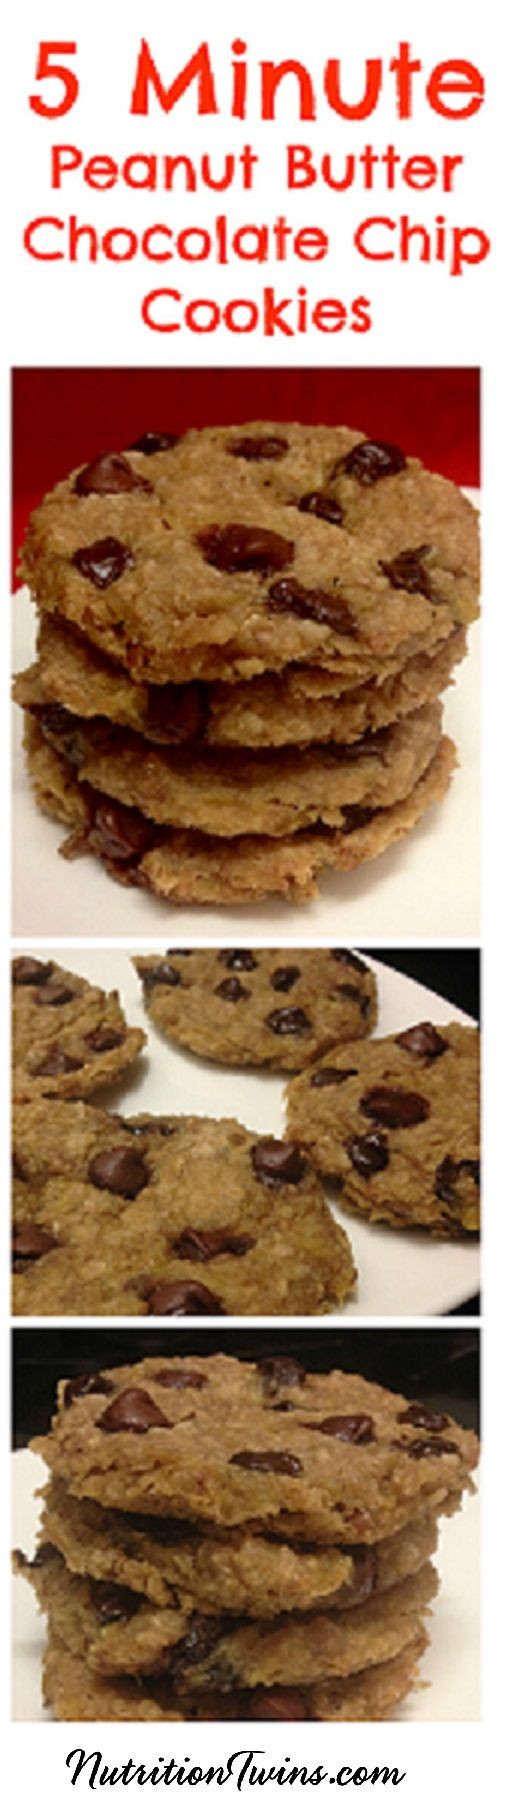 Healthy Peanut Butter Cookies 35 Calories  Microwave Peanut Butter Chocolate Chip Cookies